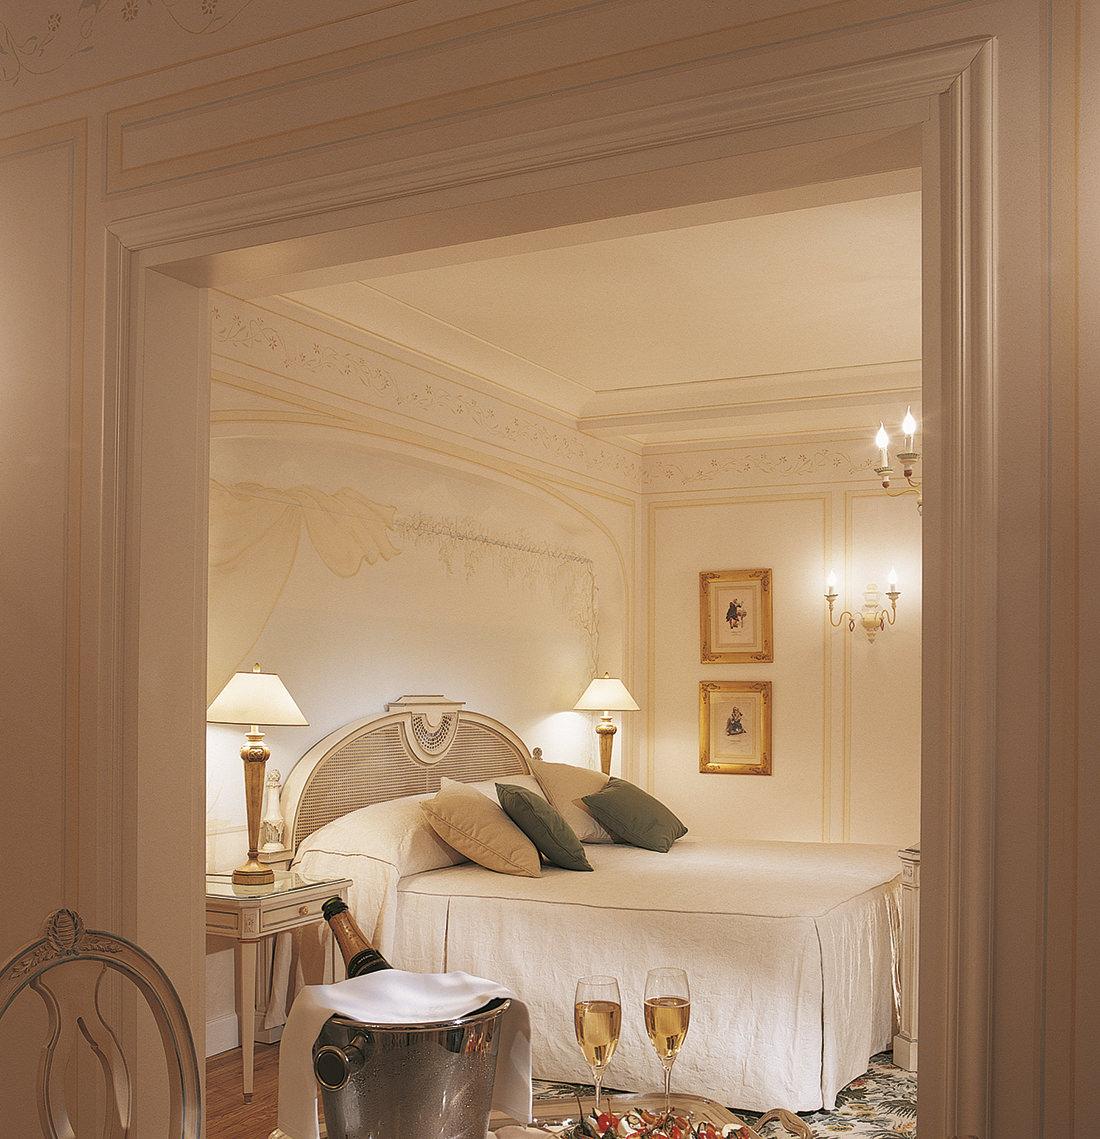 belmond-hotel-splendido-5